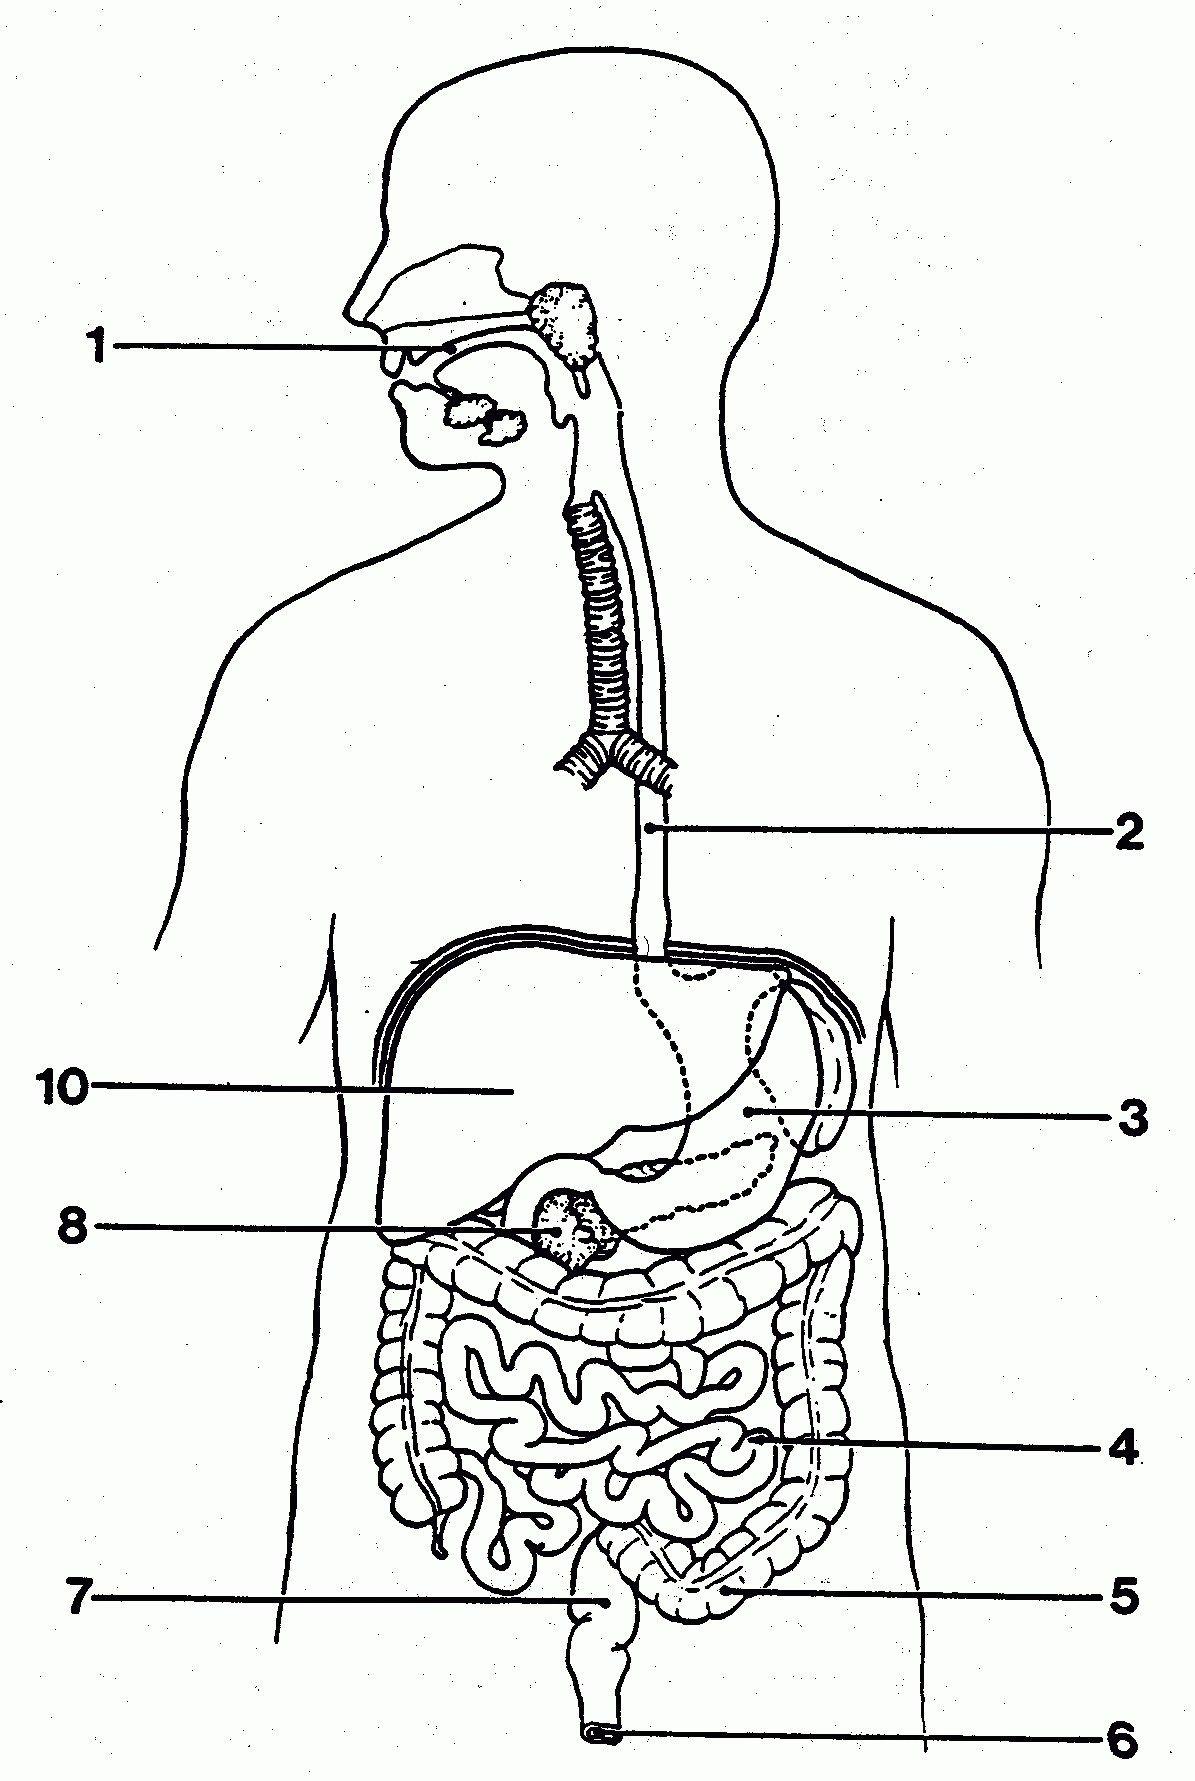 medium resolution of simple digestive system diagram simple digestive system diagram pictures simple digestive system diagram anatomy and